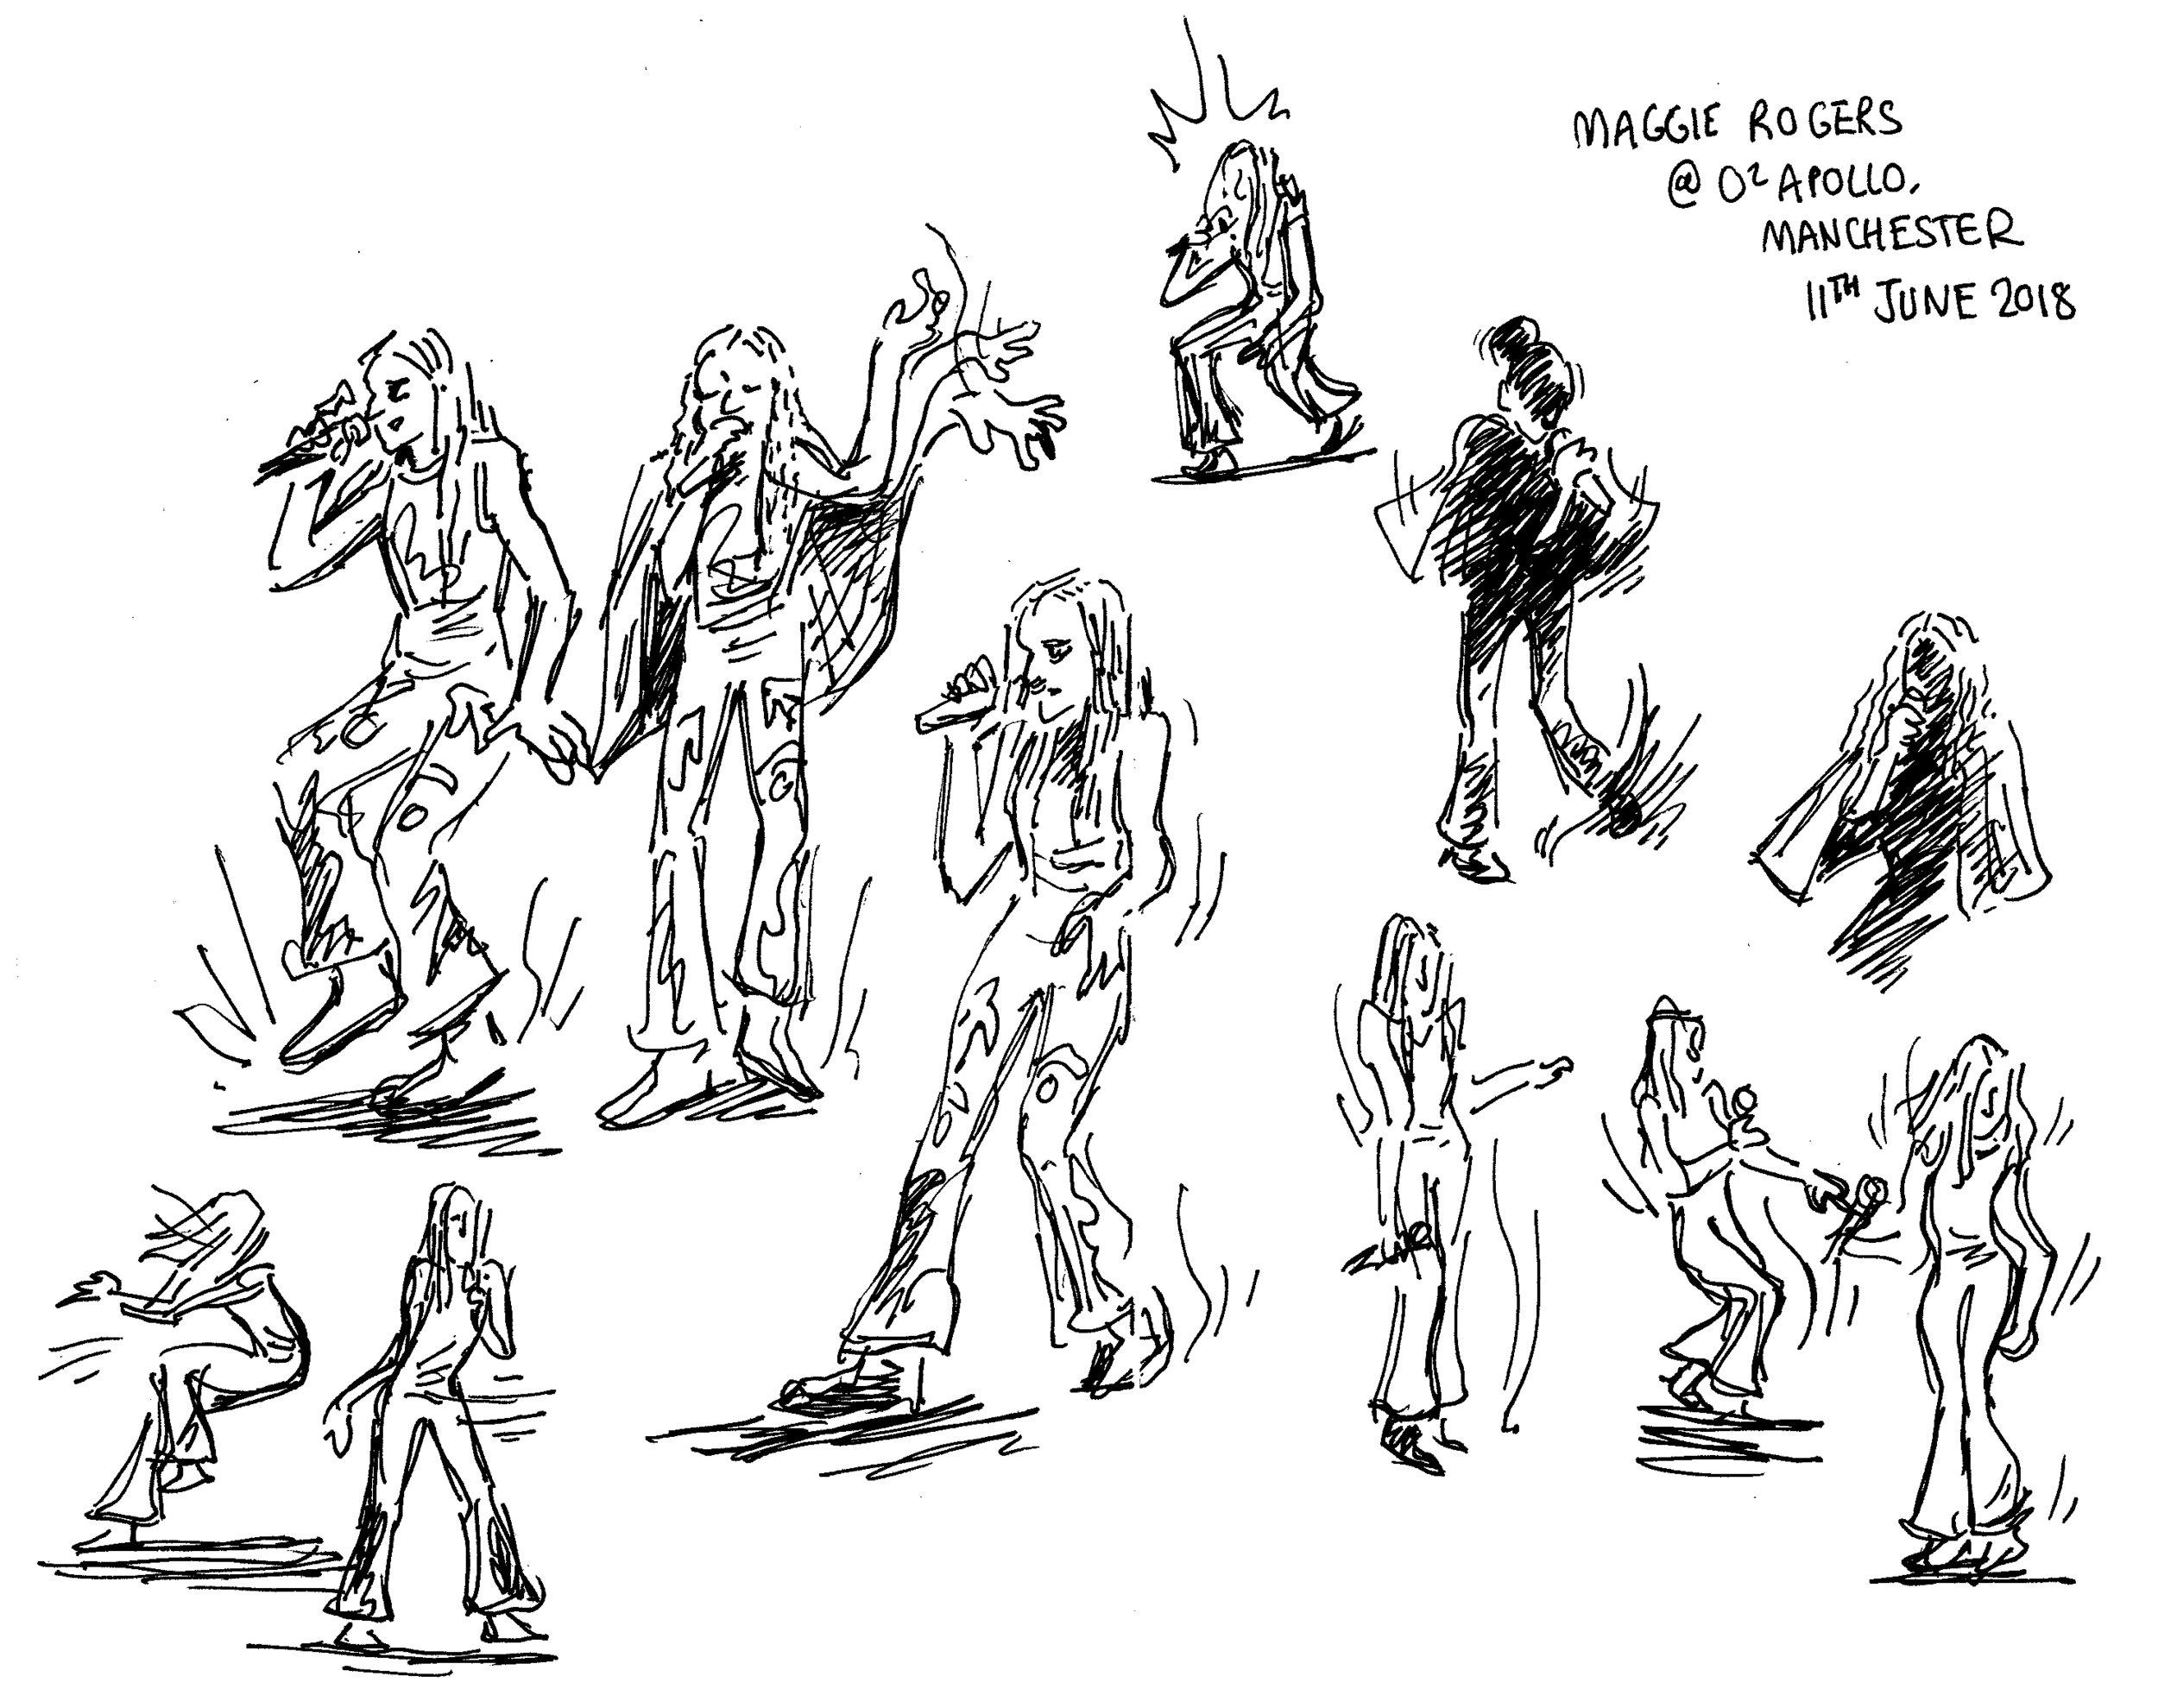 gig sketches (218).jpg